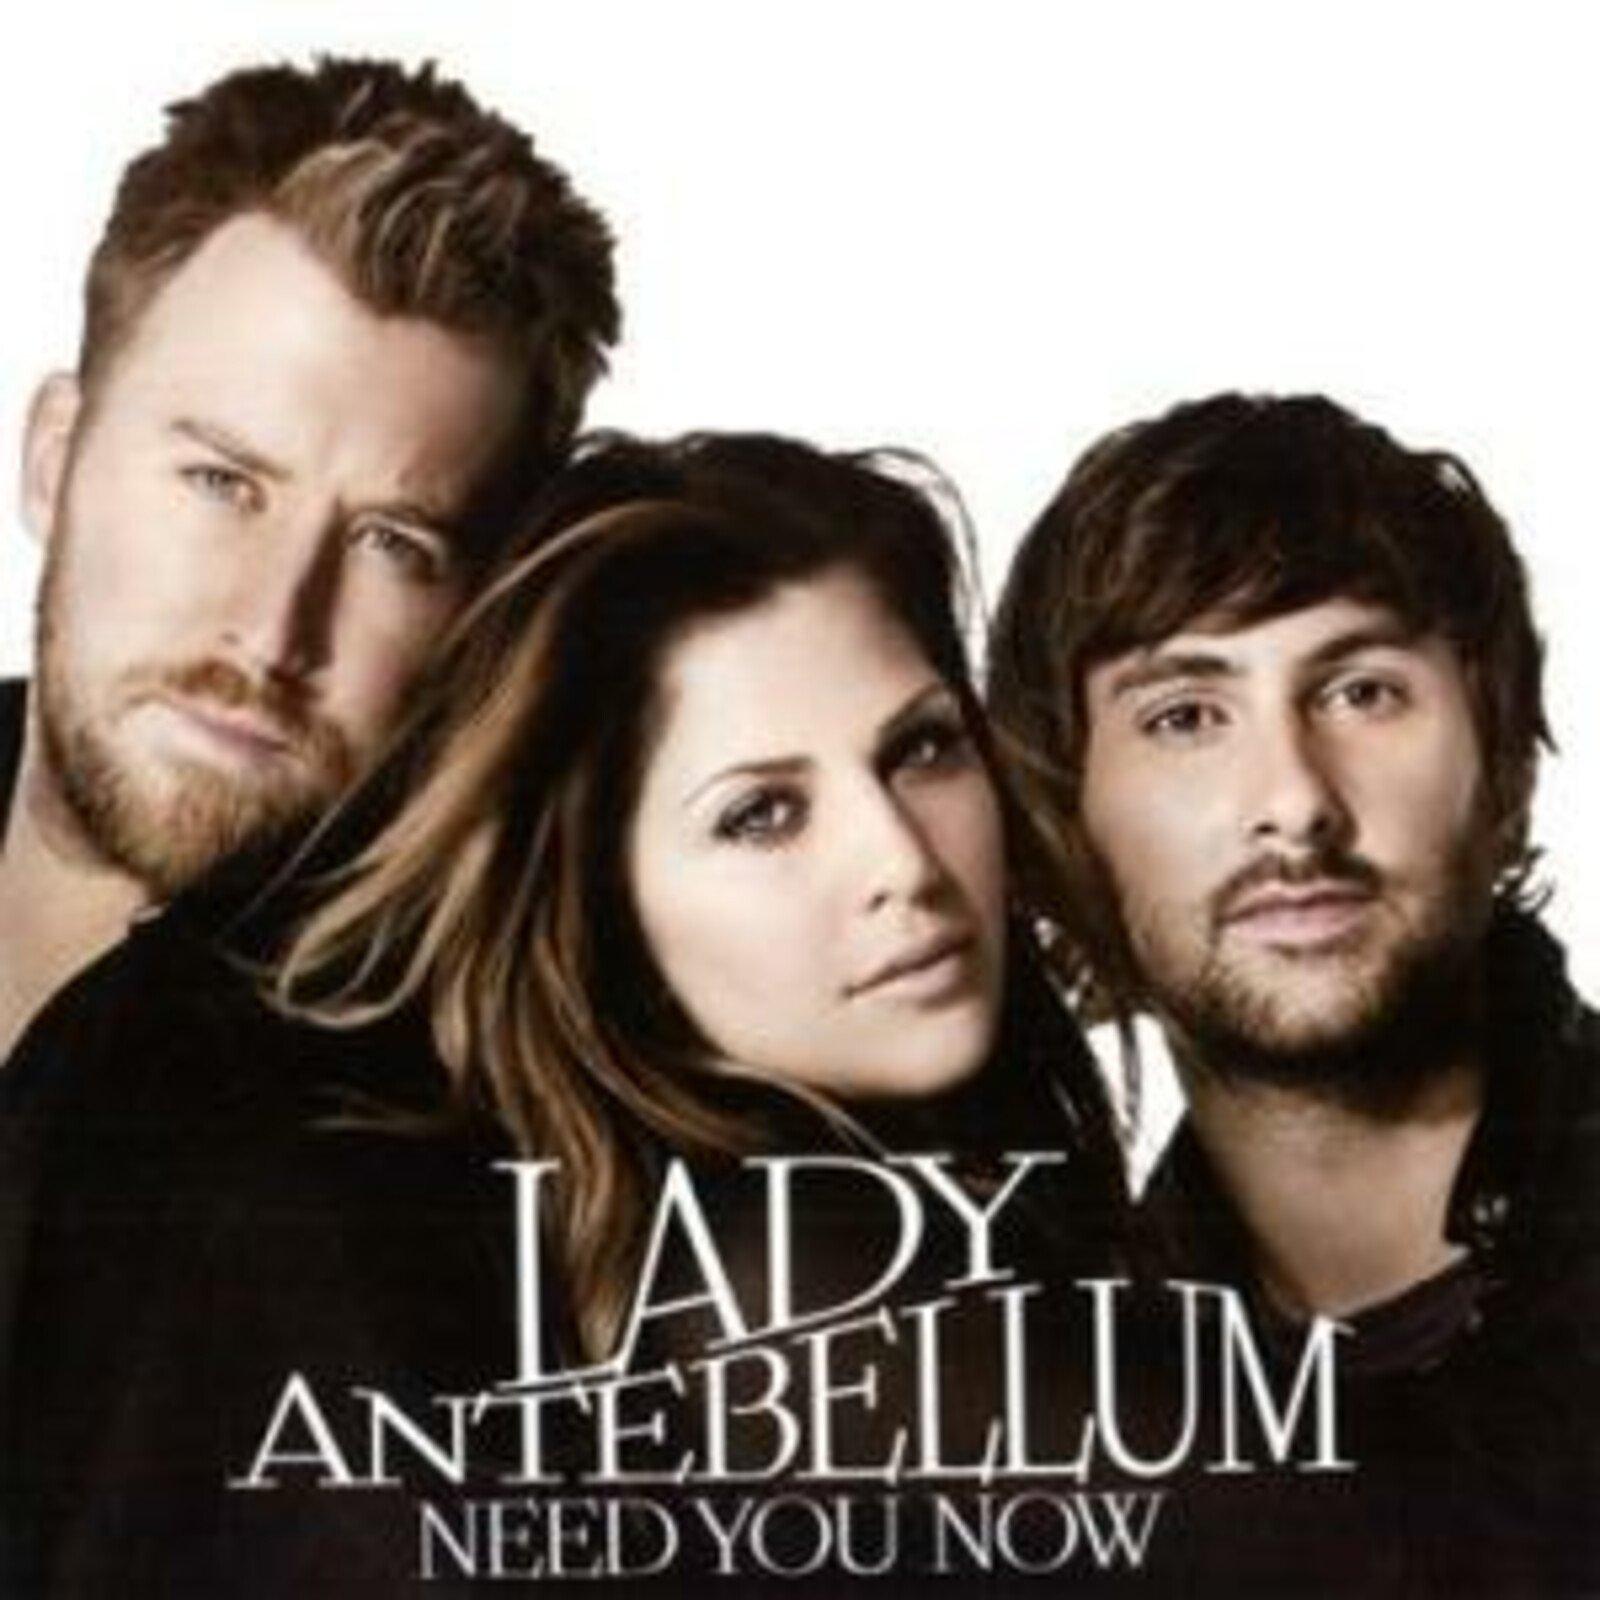 Lady Antebellum - Lady Antebellum - Need You Now [CD] 2